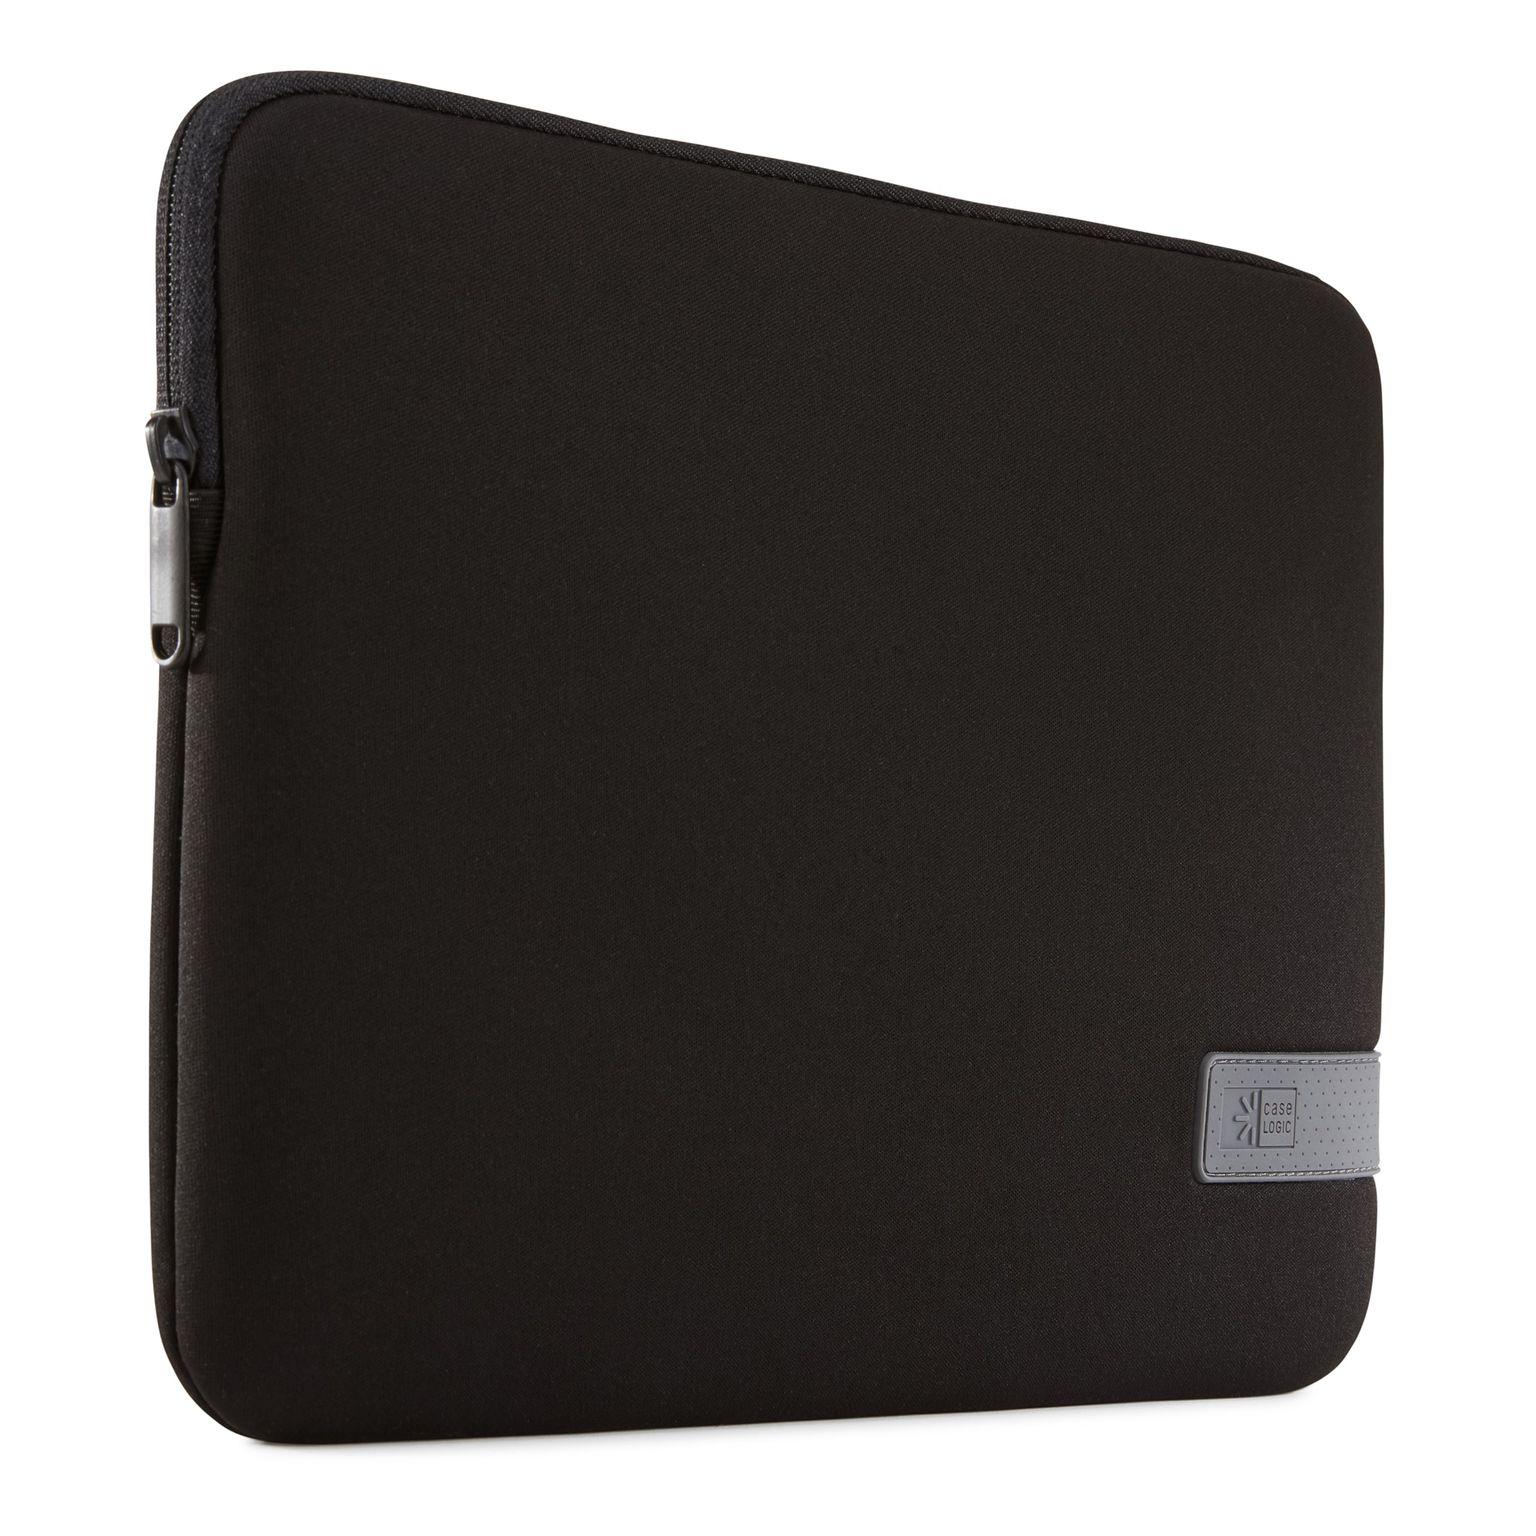 "Case Logic Reflect MacBook Sleeve 13"" No personalization Black"